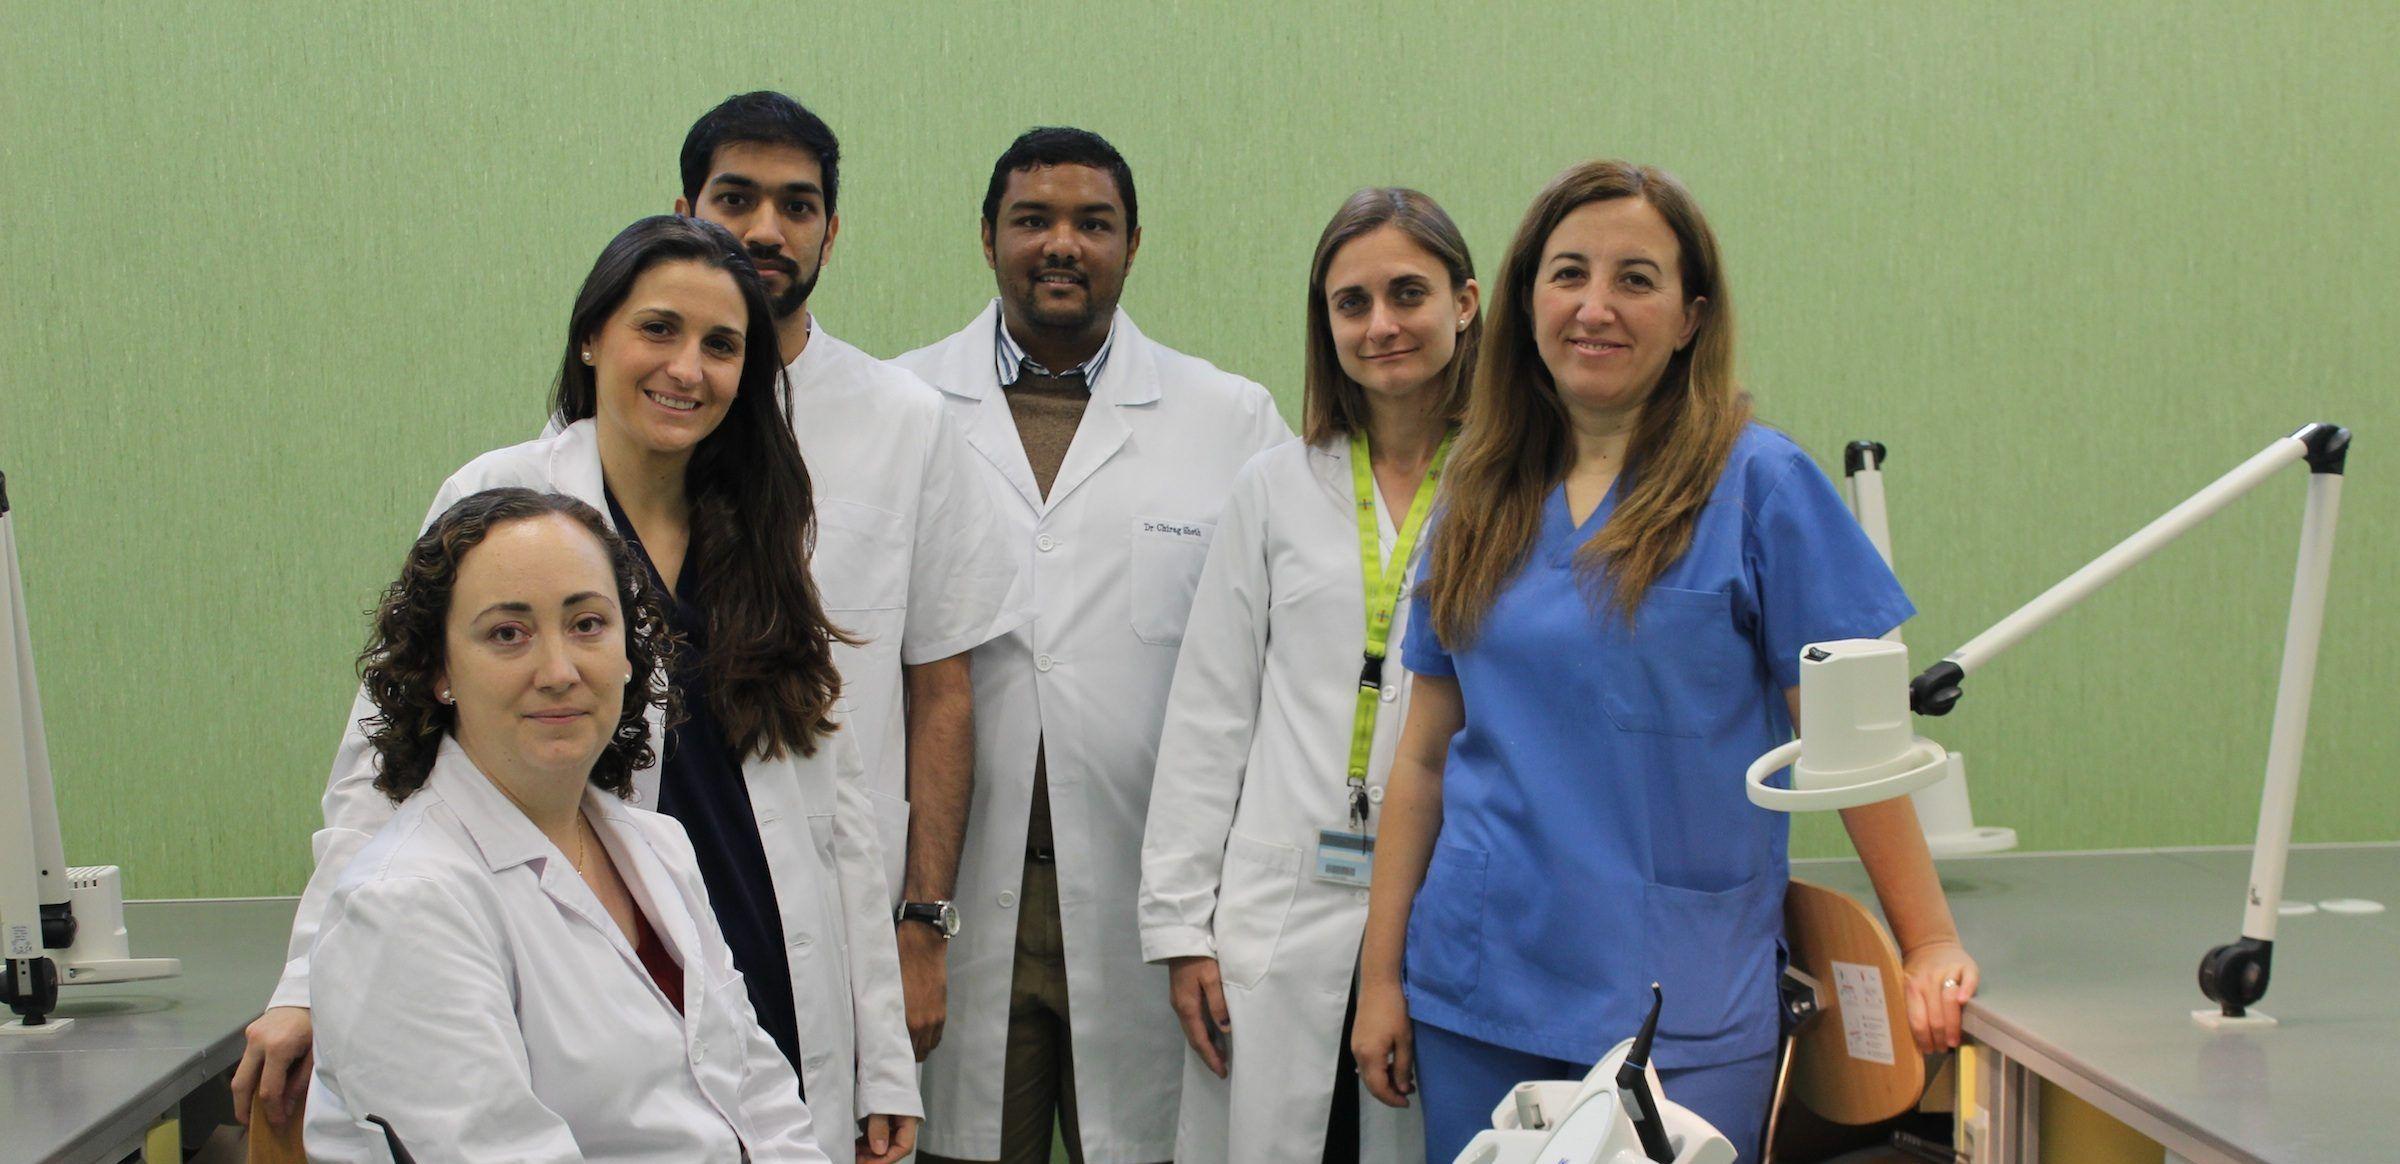 grupo-microbiologia-oral-ceu-uch-2